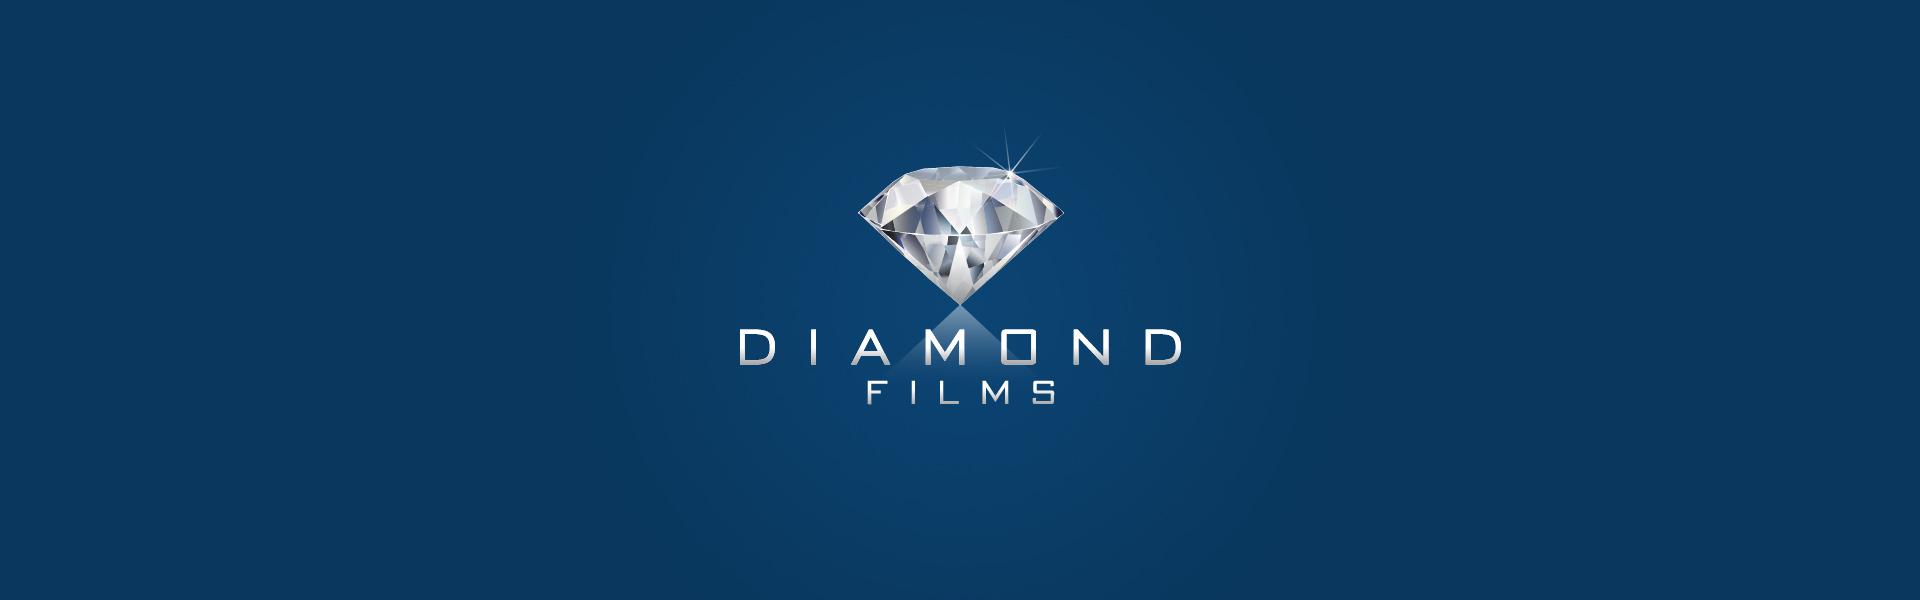 DIAMOND FILMS BRASIL LTDA.